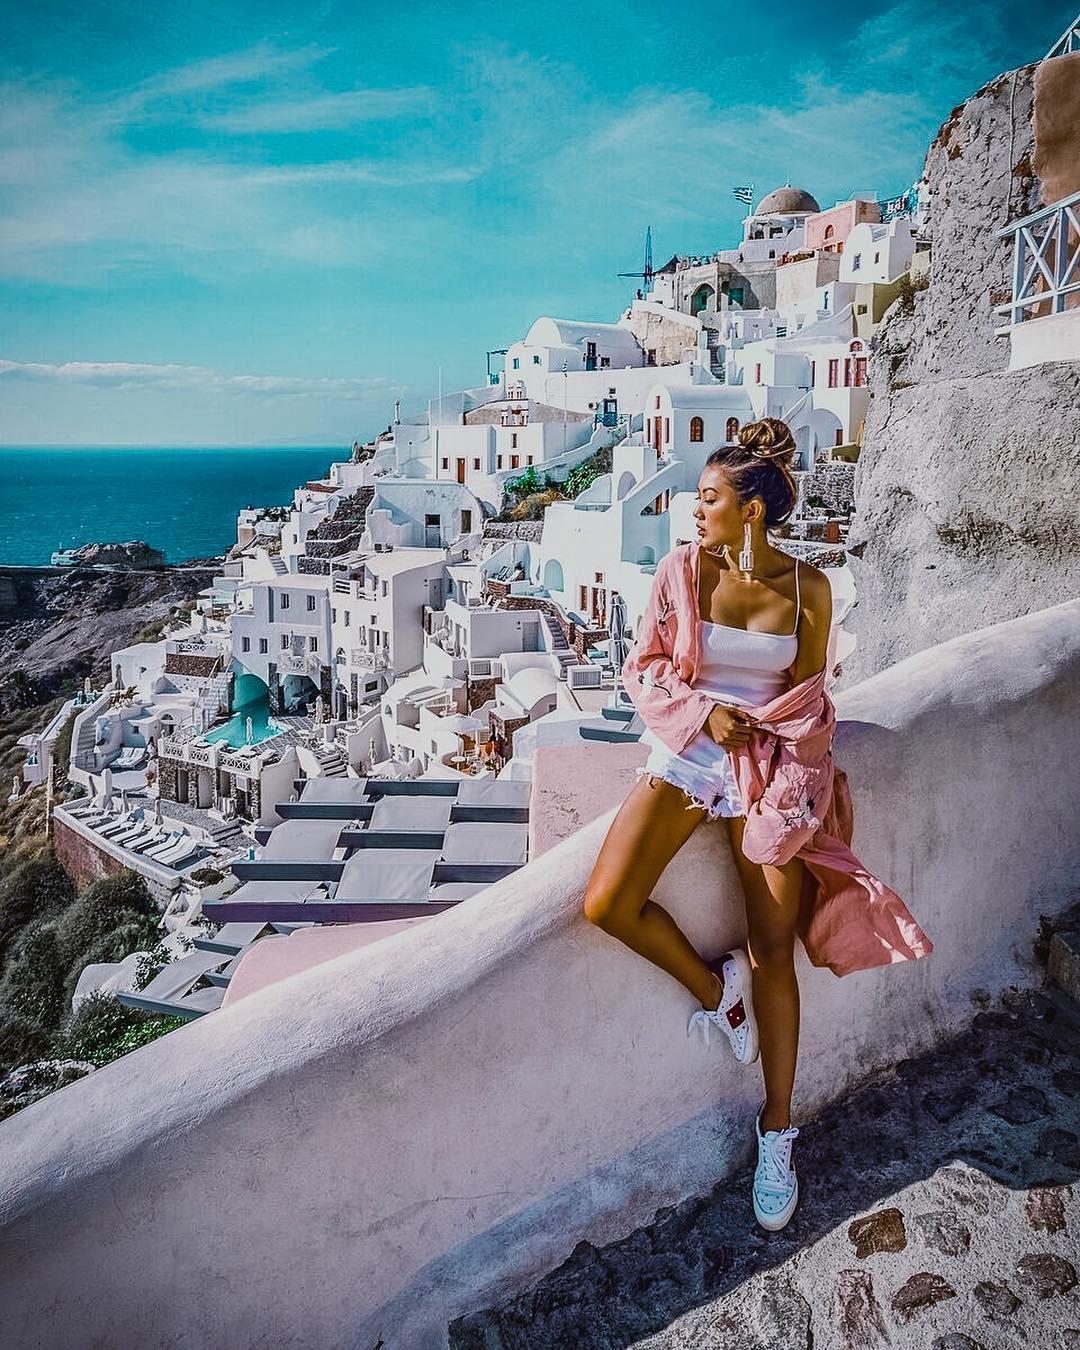 Pink Kimono For Santorini Trip This Summer 2019